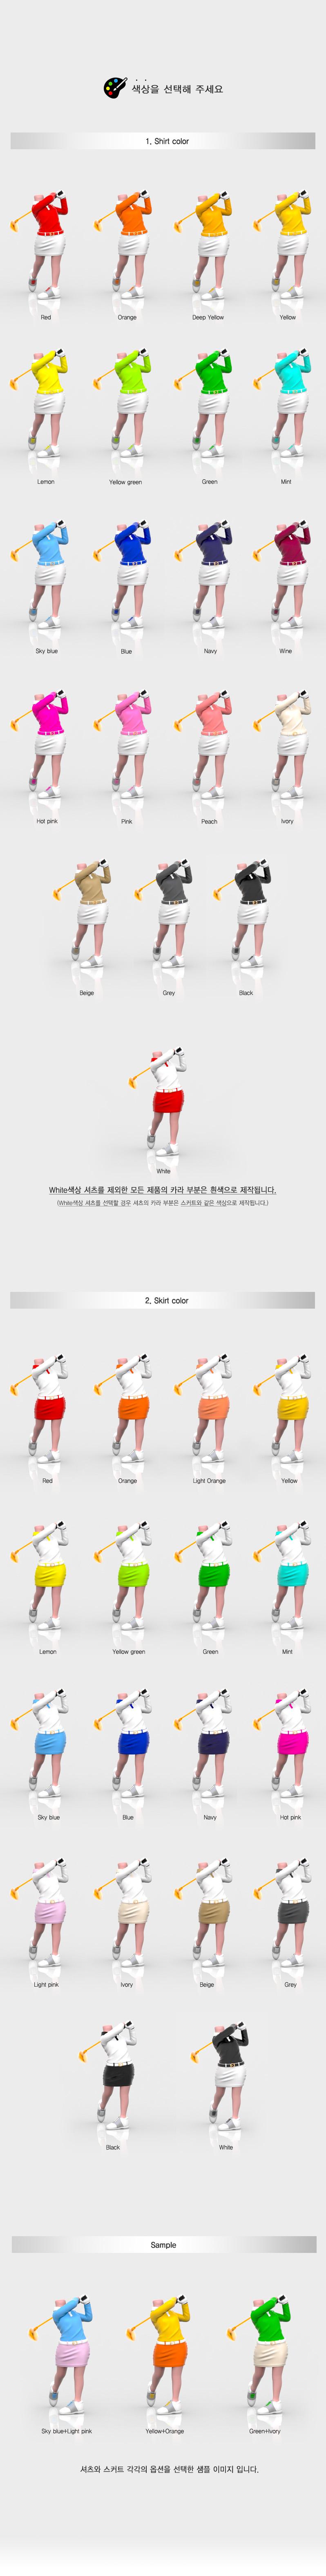 golf_w_skirt03_coloroption